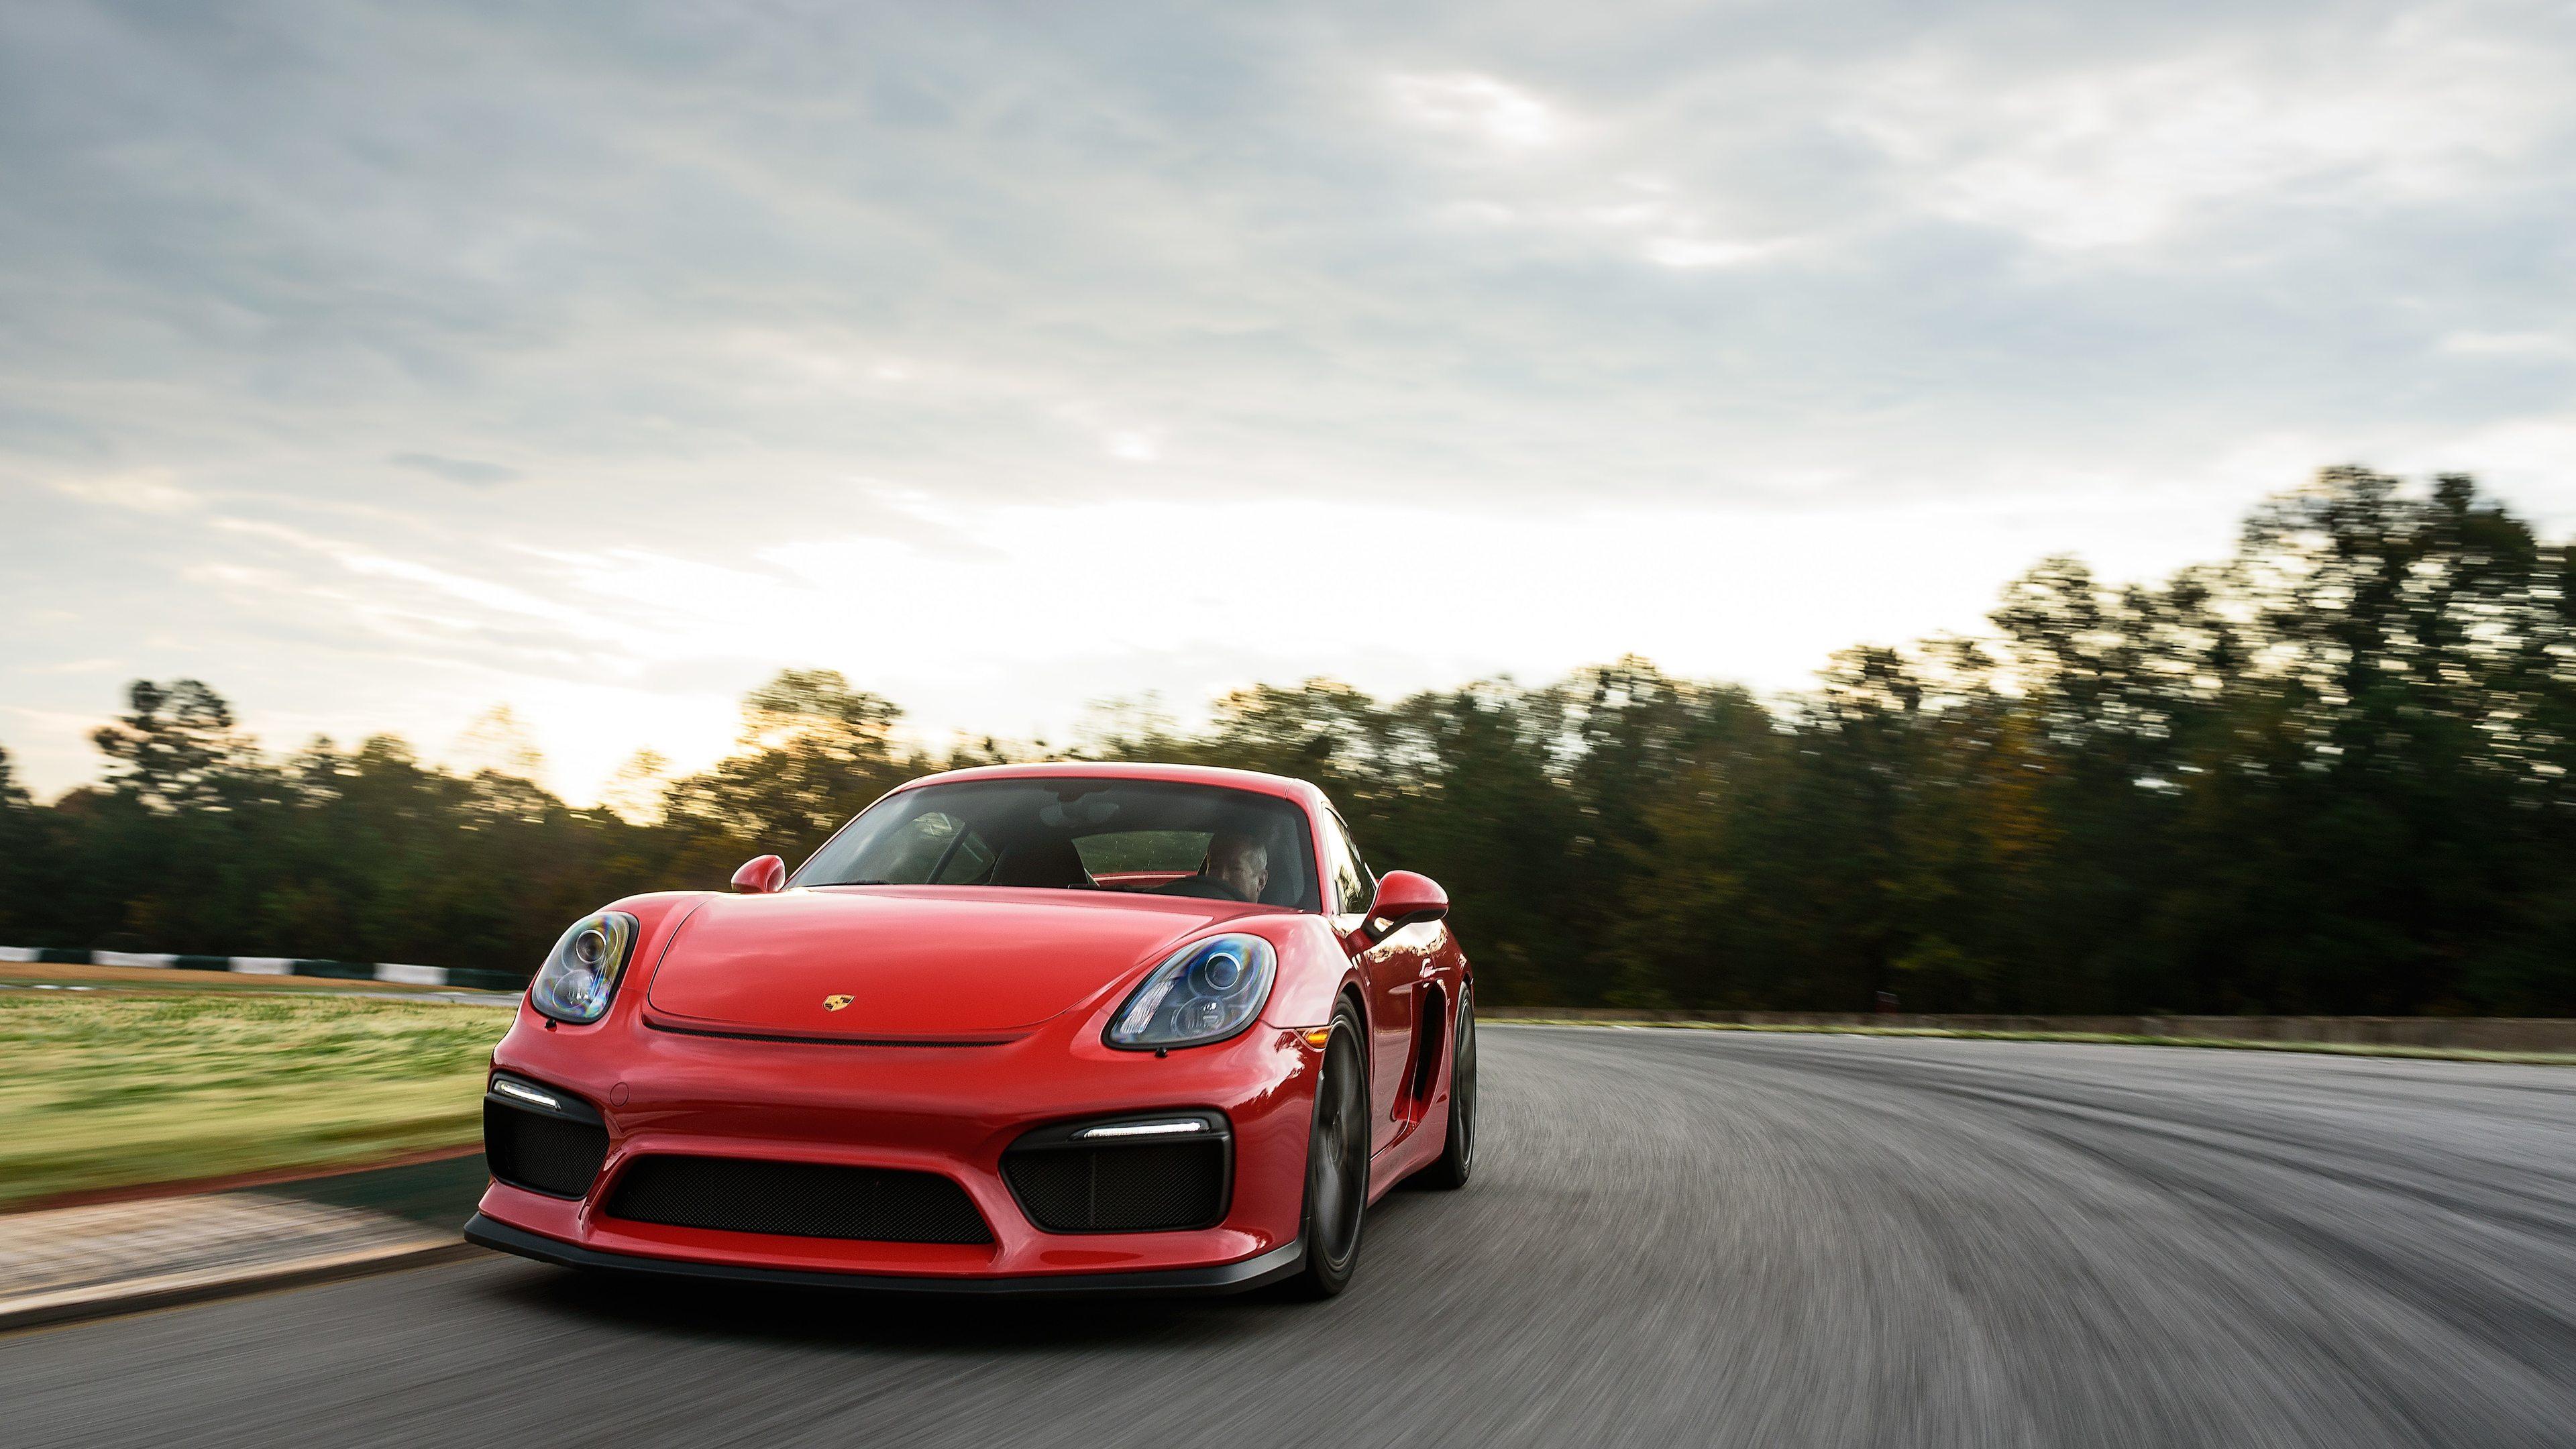 porsche cayman gt4 911 gt3 rs 1539112579 - Porsche Cayman GT4 911 GT3 RS - porsche wallpapers, porsche cayman wallpapers, hd-wallpapers, cars wallpapers, 5k wallpapers, 4k-wallpapers